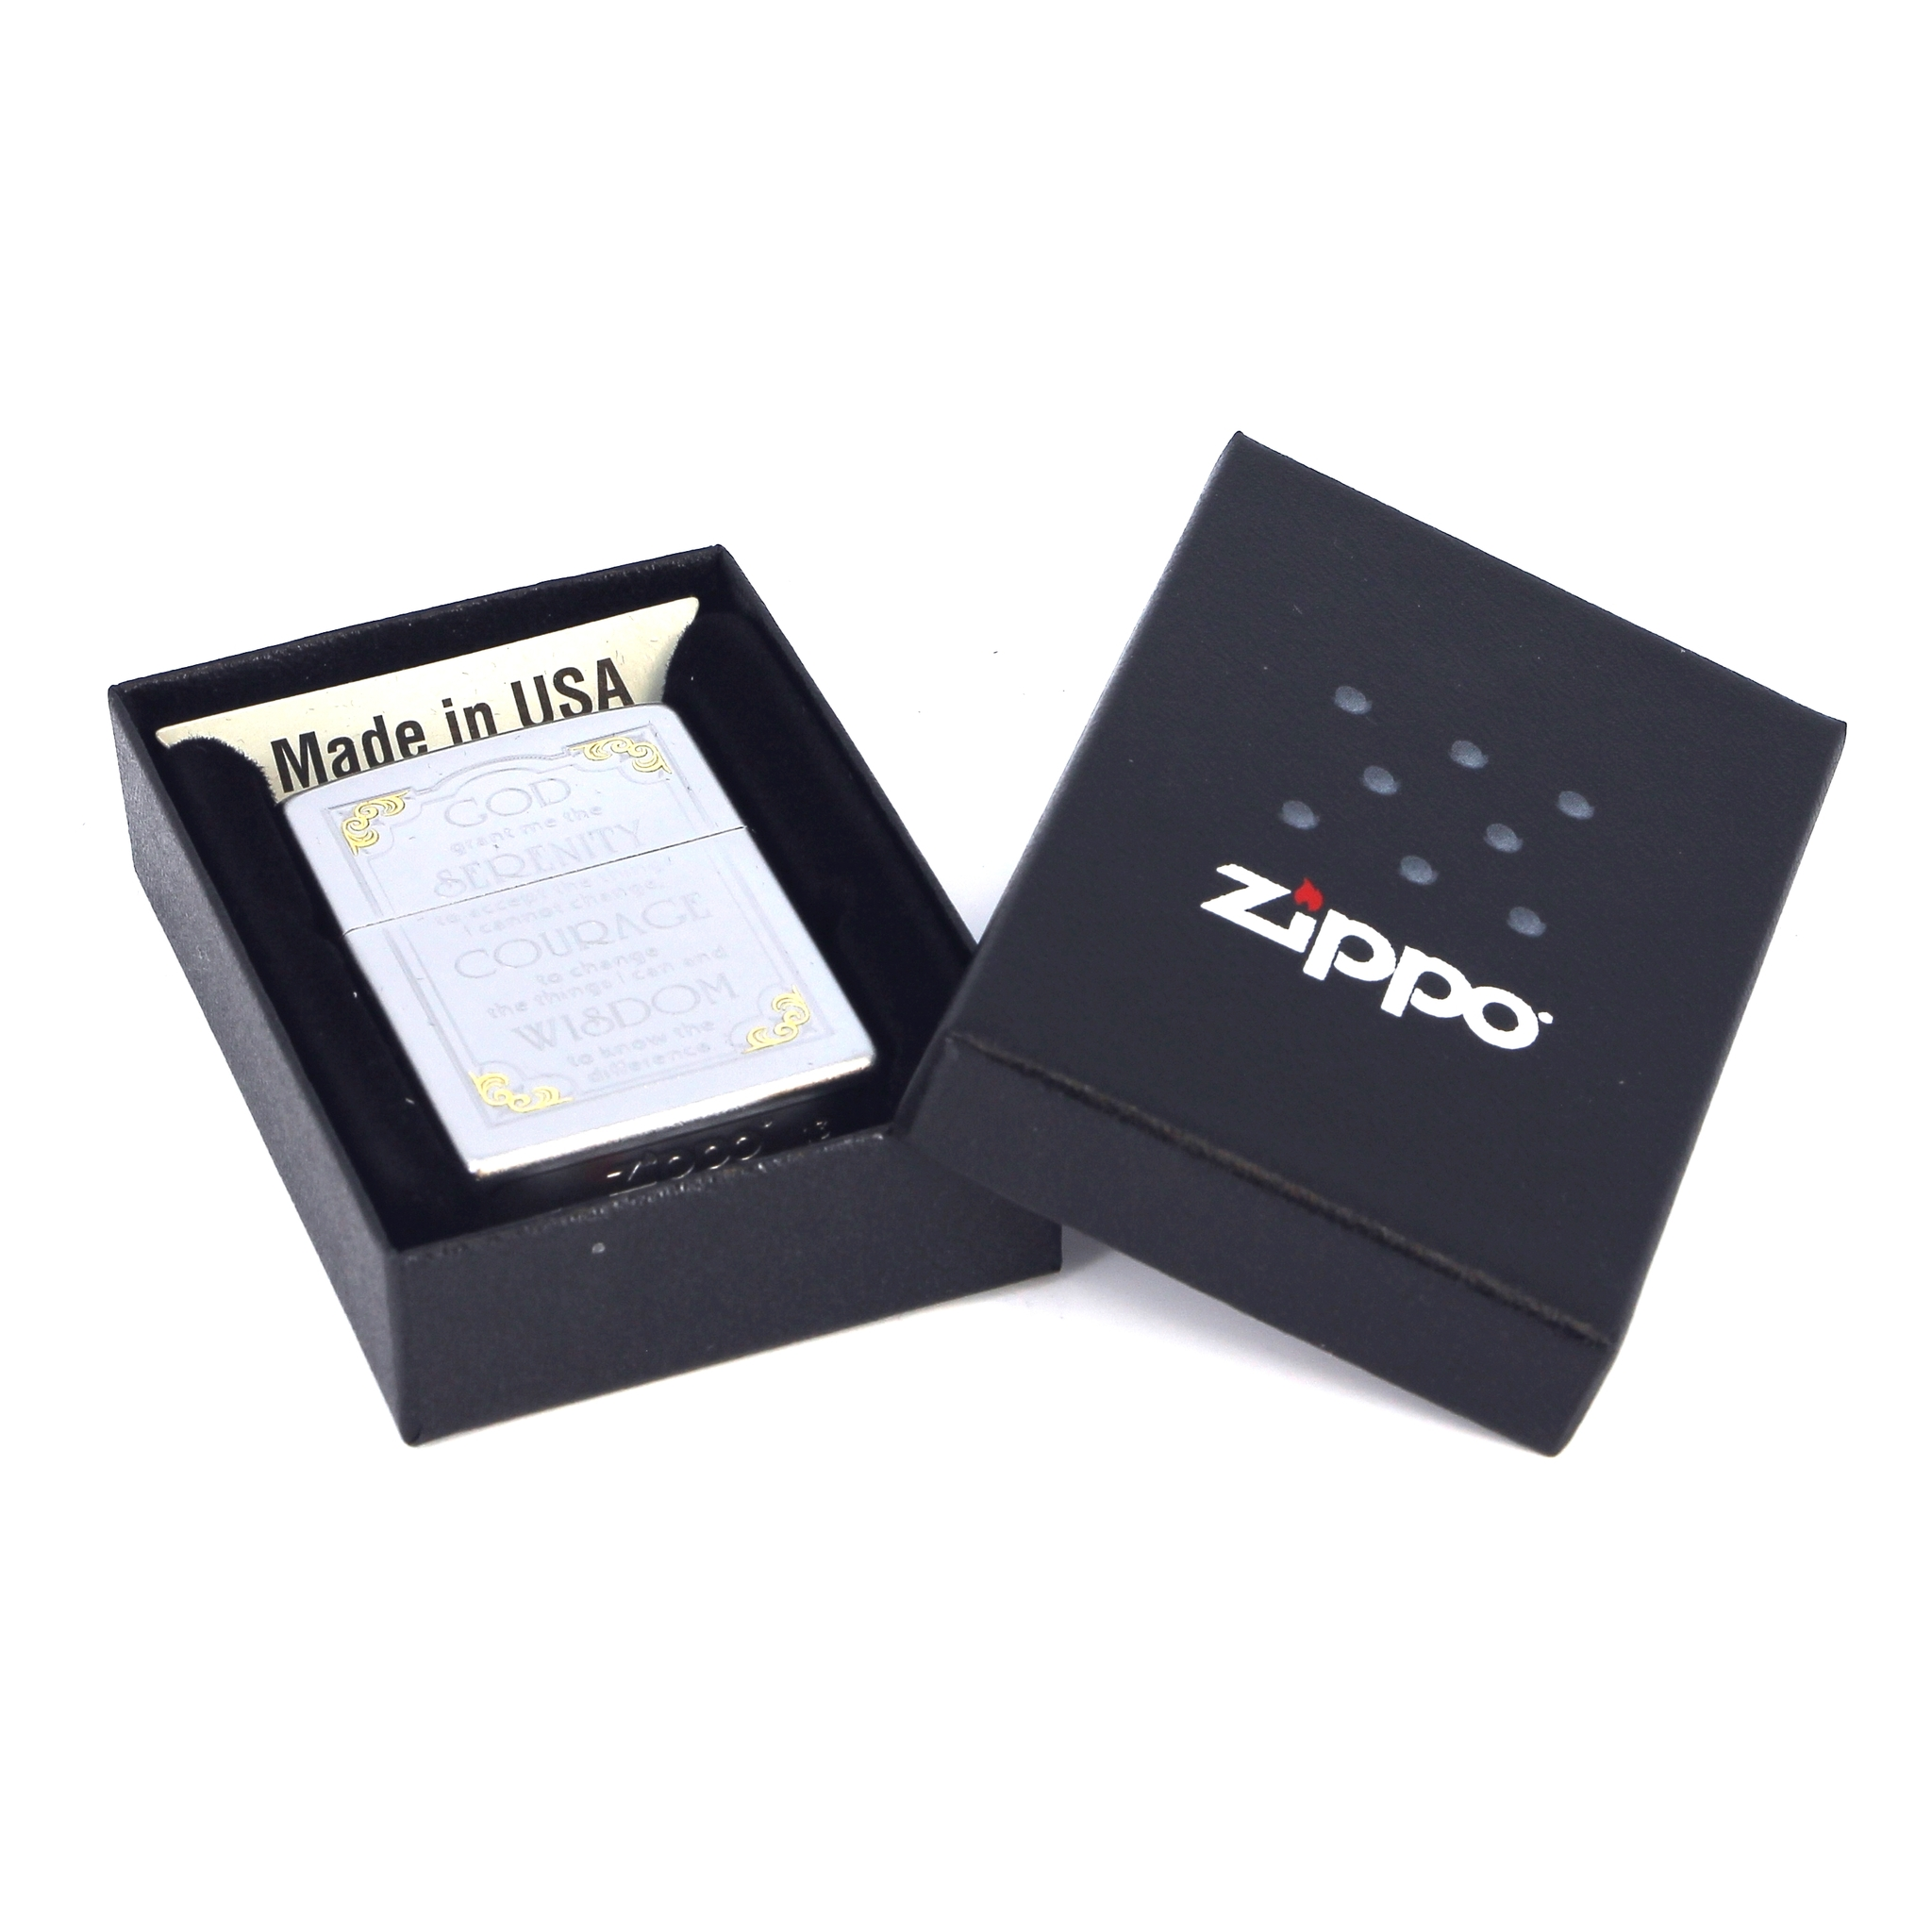 Фото 2 - Зажигалка ZIPPO Serenity, латунь с покрытием Satin Chrome™, серебристый, матовая, 36х12x56 мм